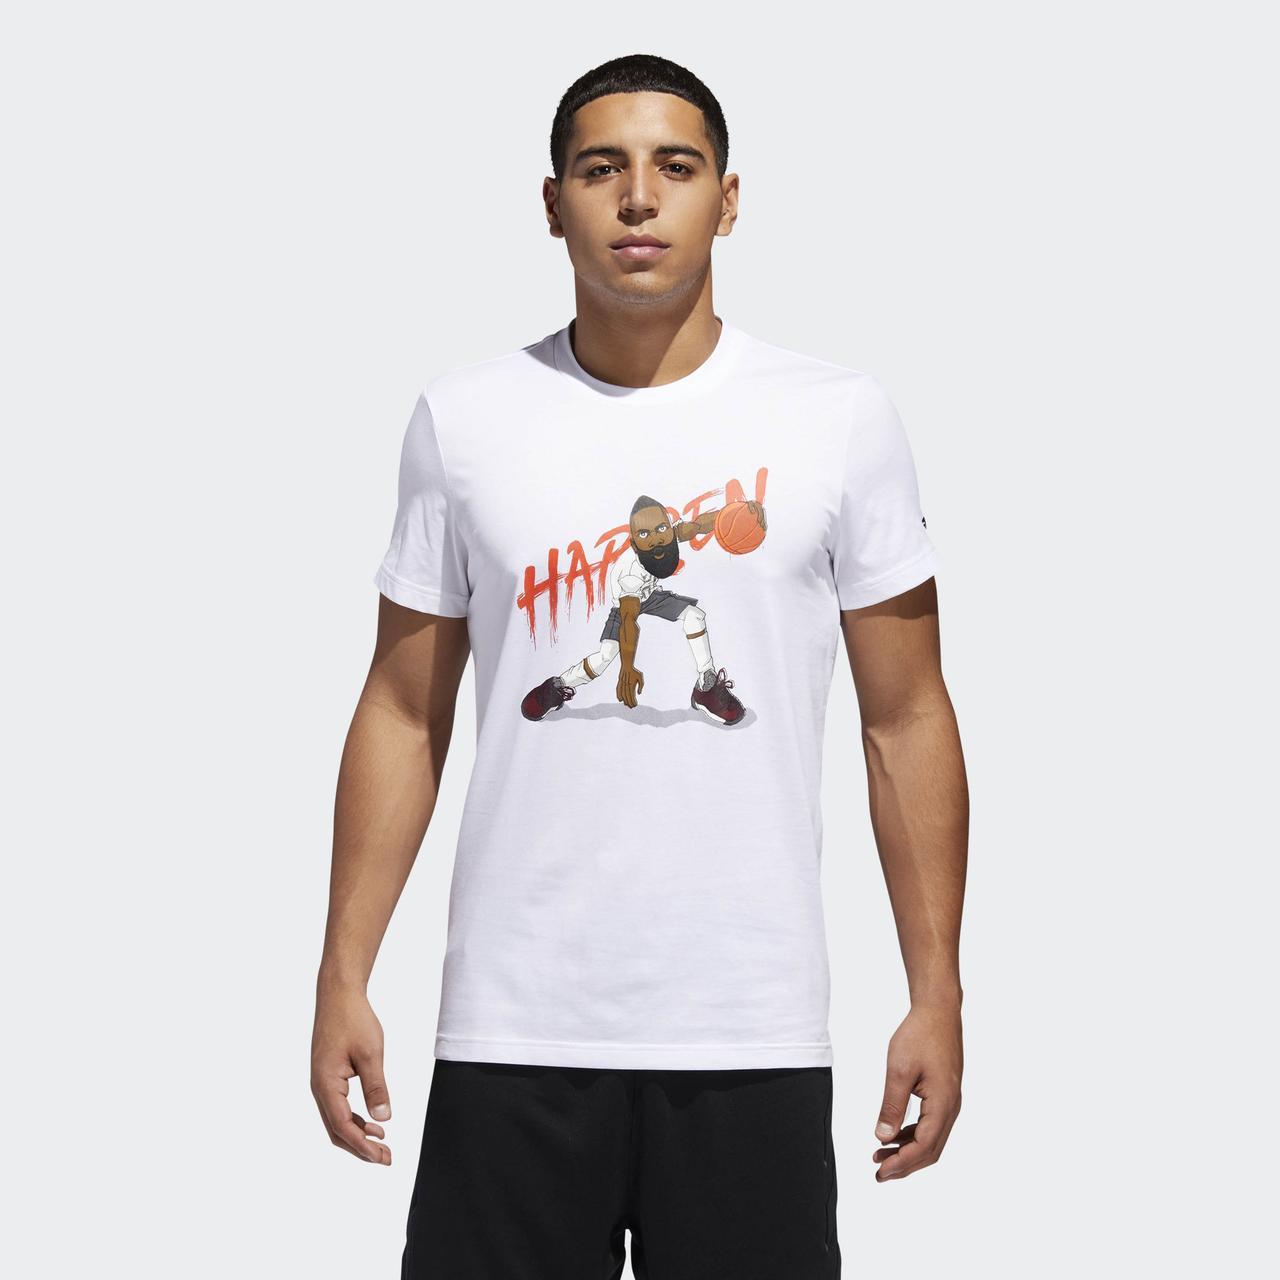 Мужская футболка Adidas Performance Harden Geek UP (Артикул: CW9224)